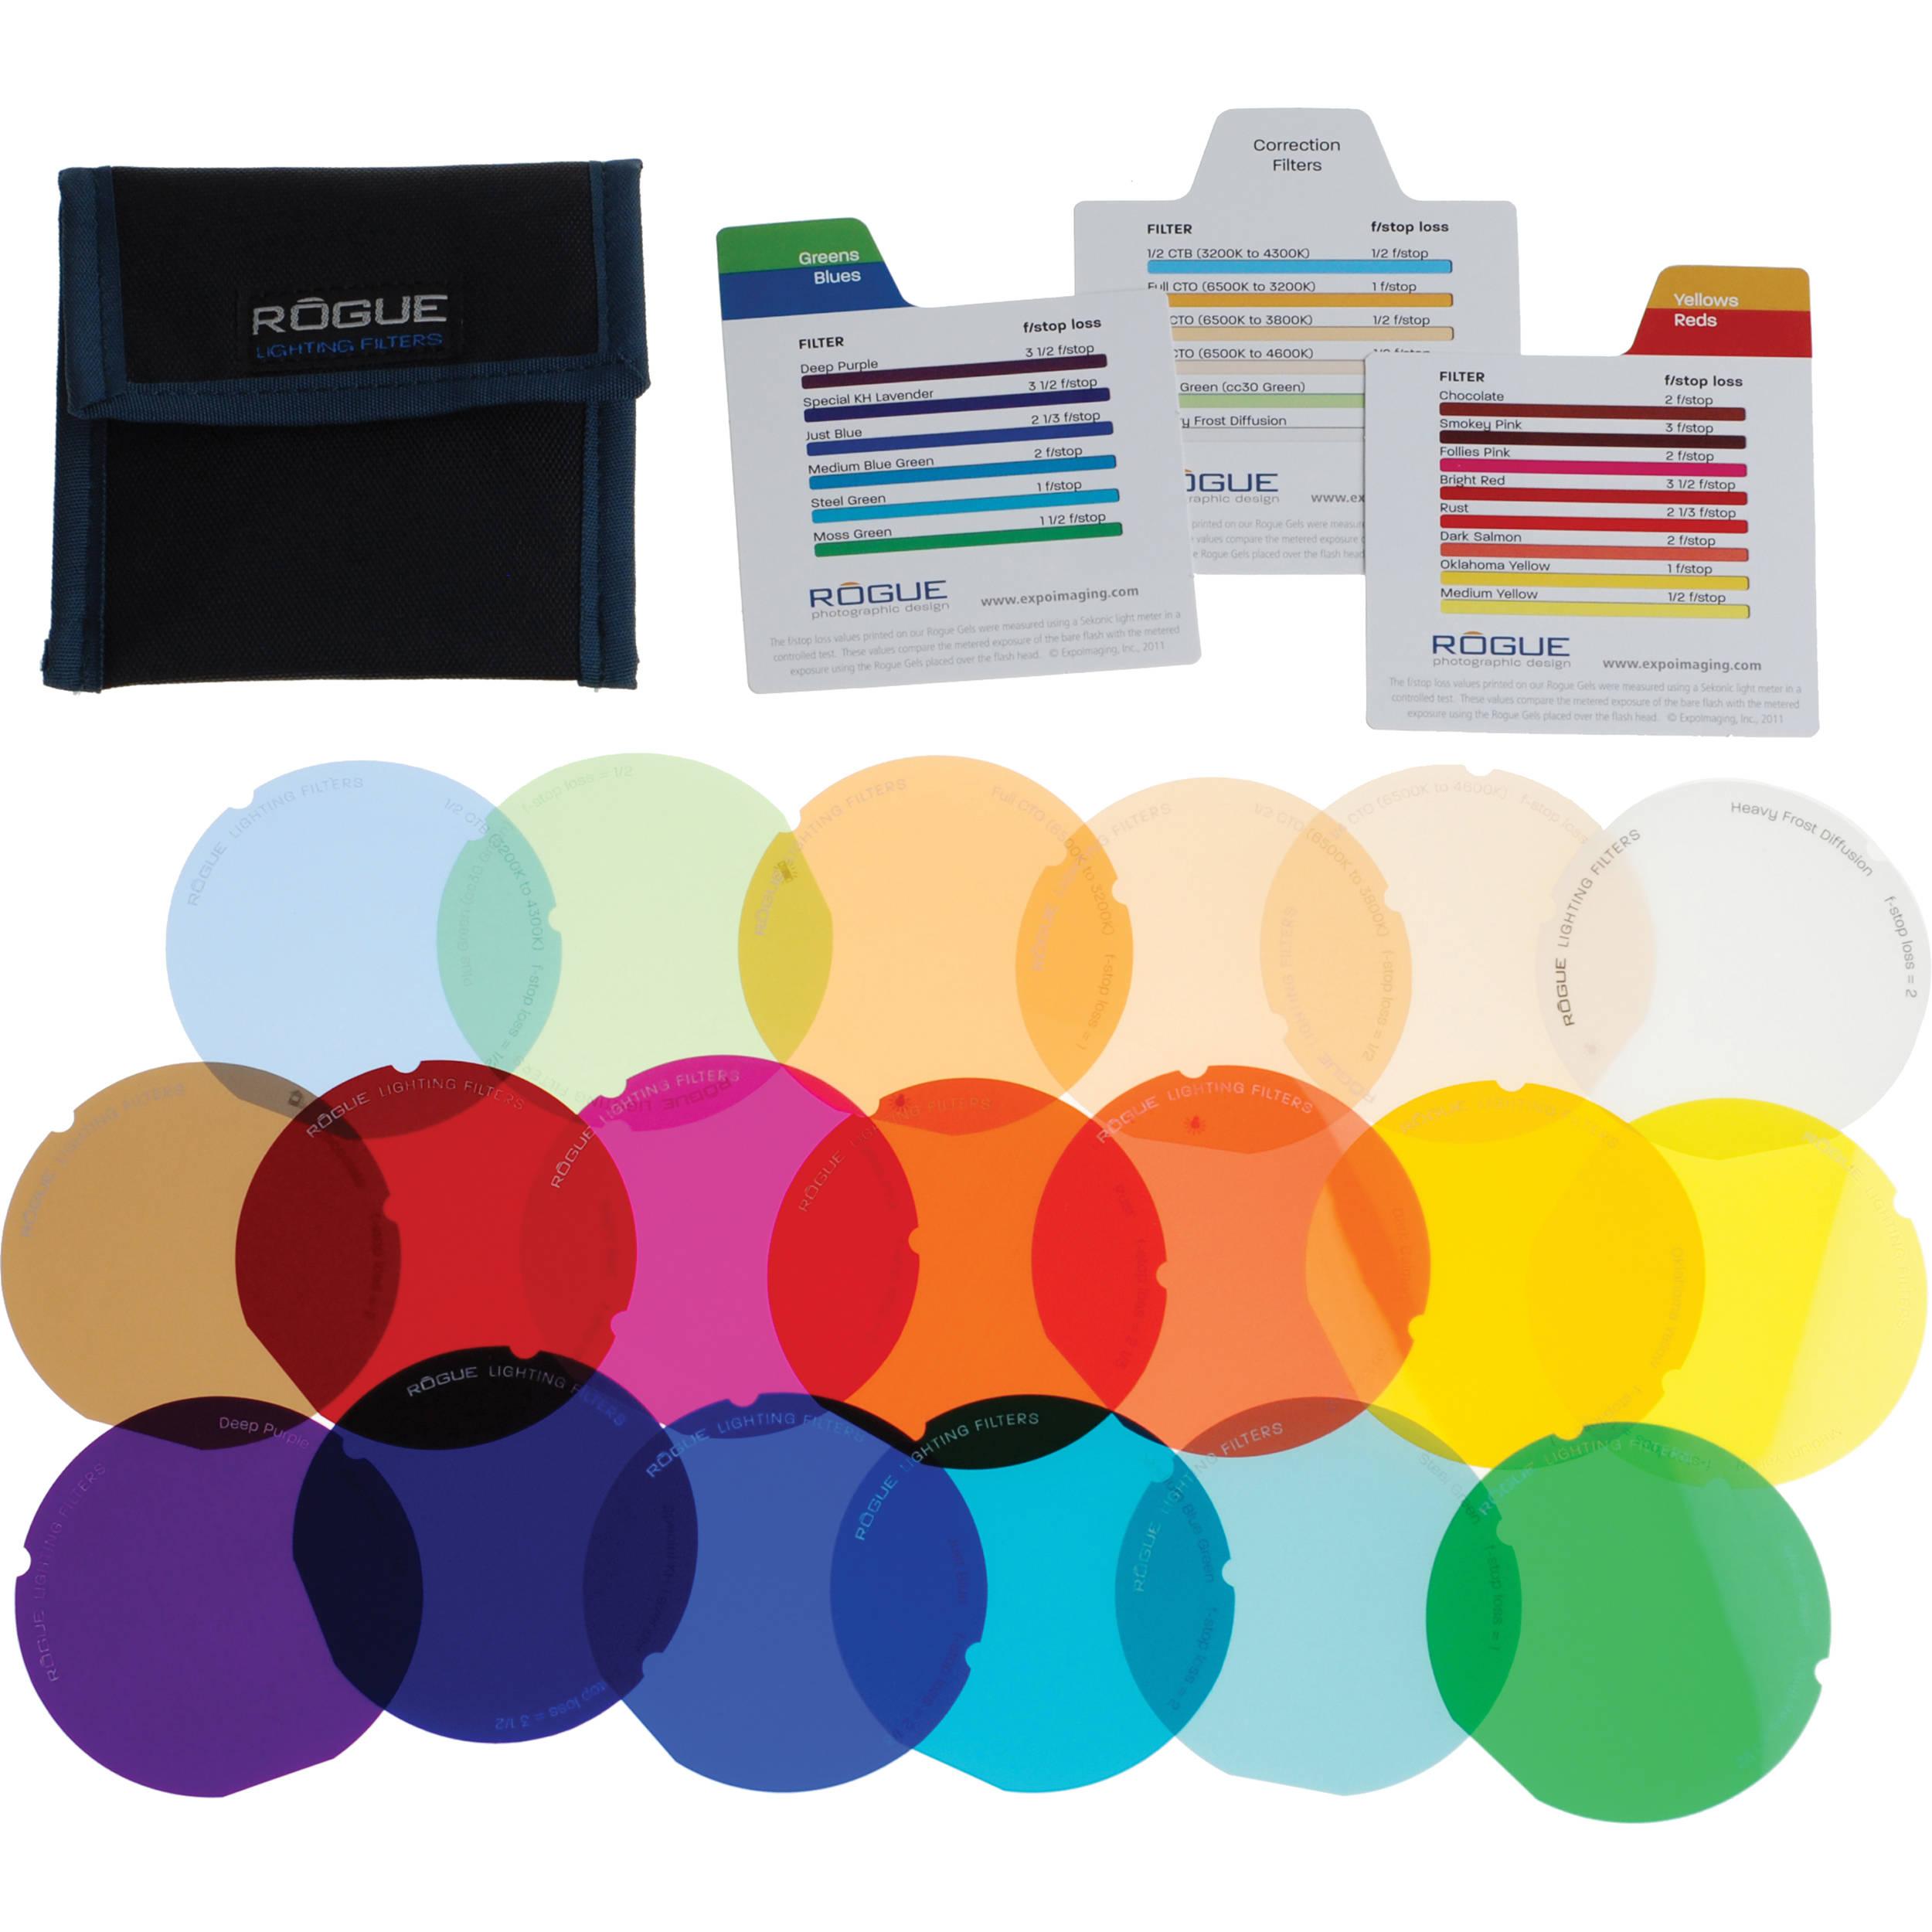 expoimaging rogue gels lighting filter kit for rogue roguegels g